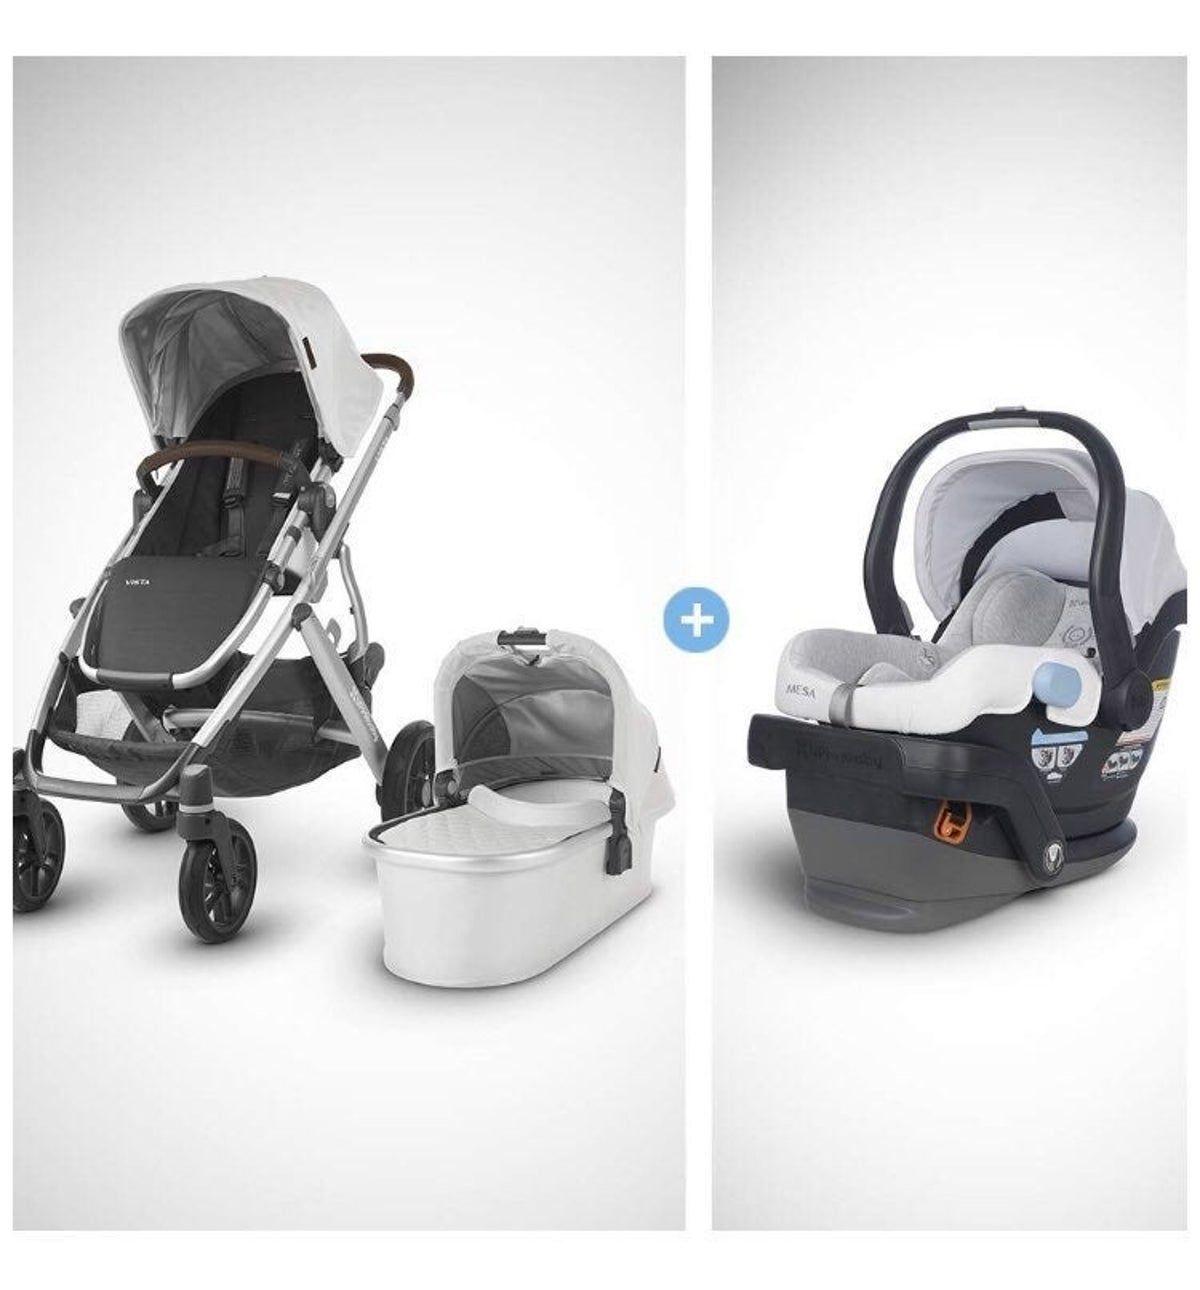 stroller vista 2019 + car seat+ base in 2020 Baby car